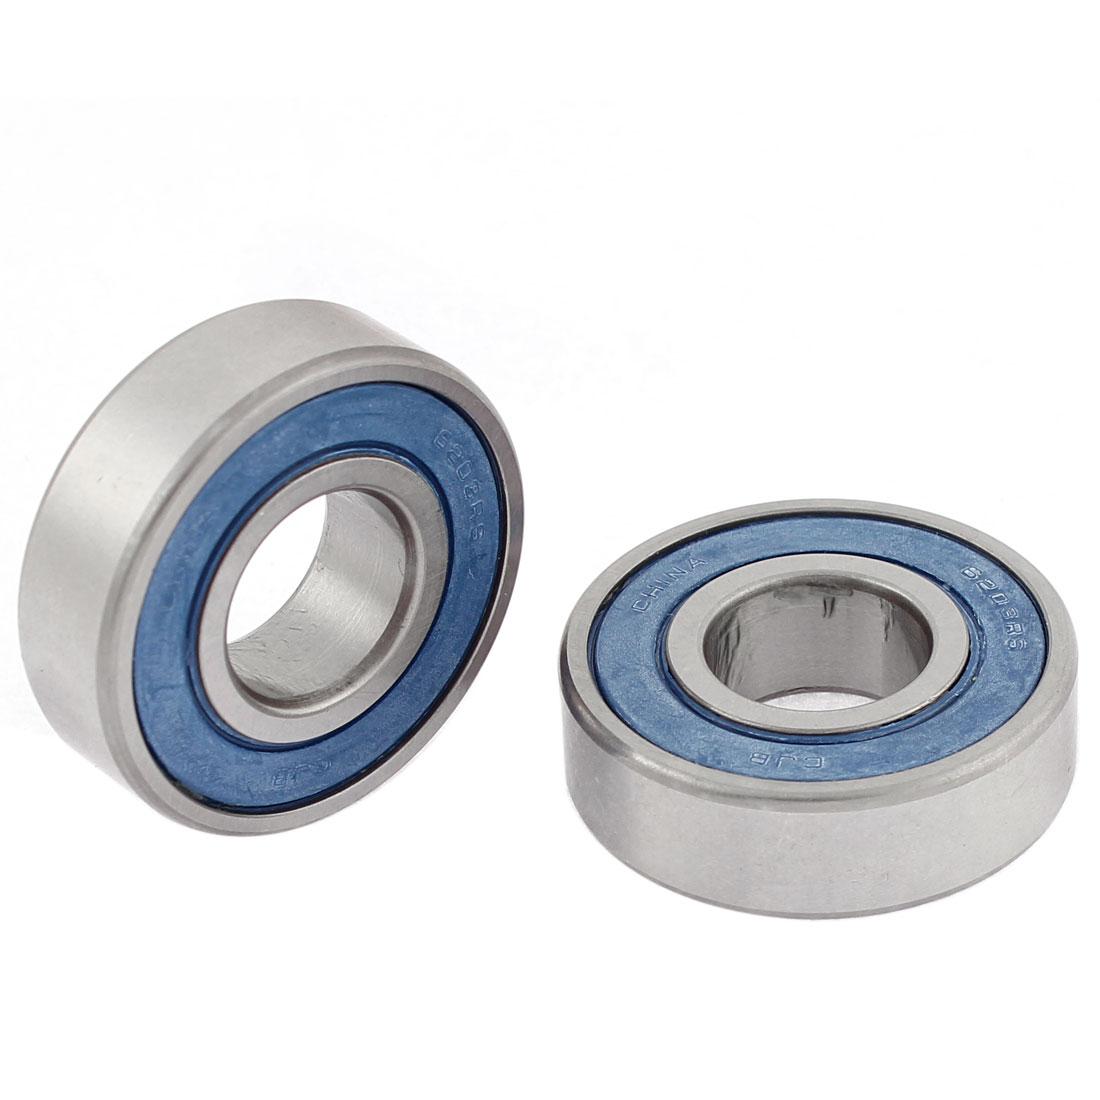 6203RS Deep Groove Ball Wheel Bearings Silver Tone Blue 17mm x 40mm x 12mm 2 Pcs